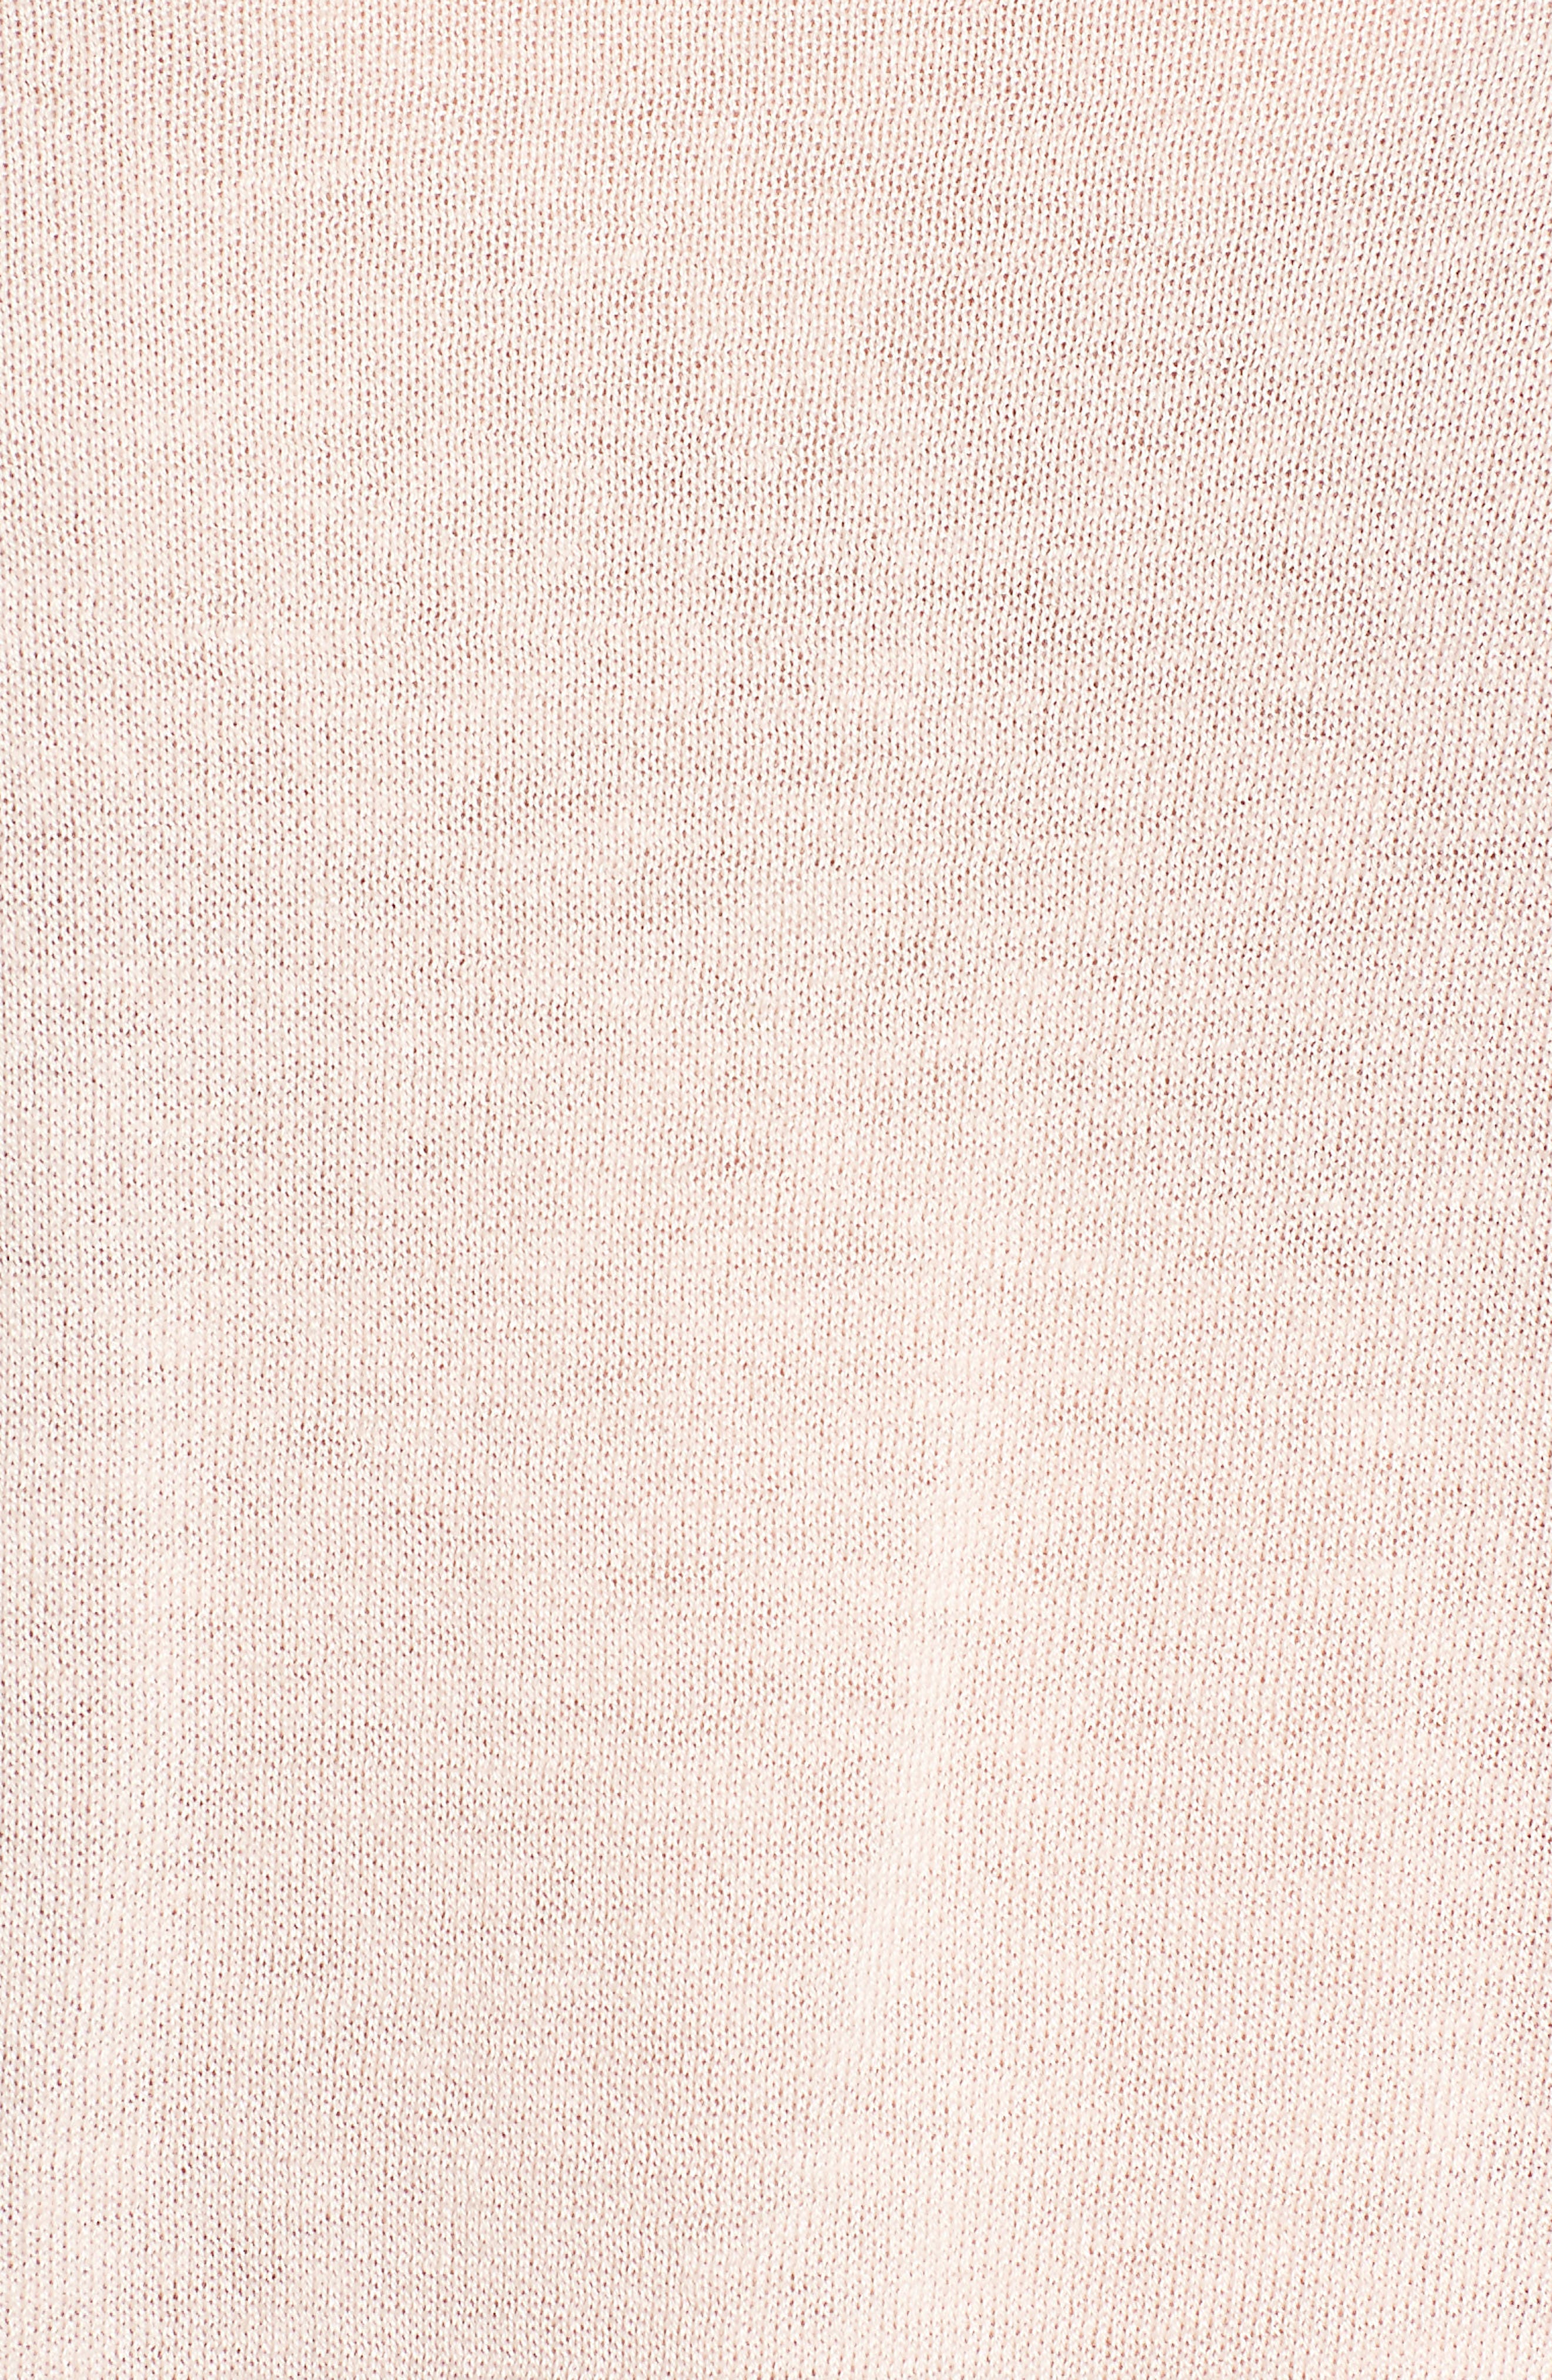 Convertible Bateau Neck Sweater,                             Alternate thumbnail 15, color,